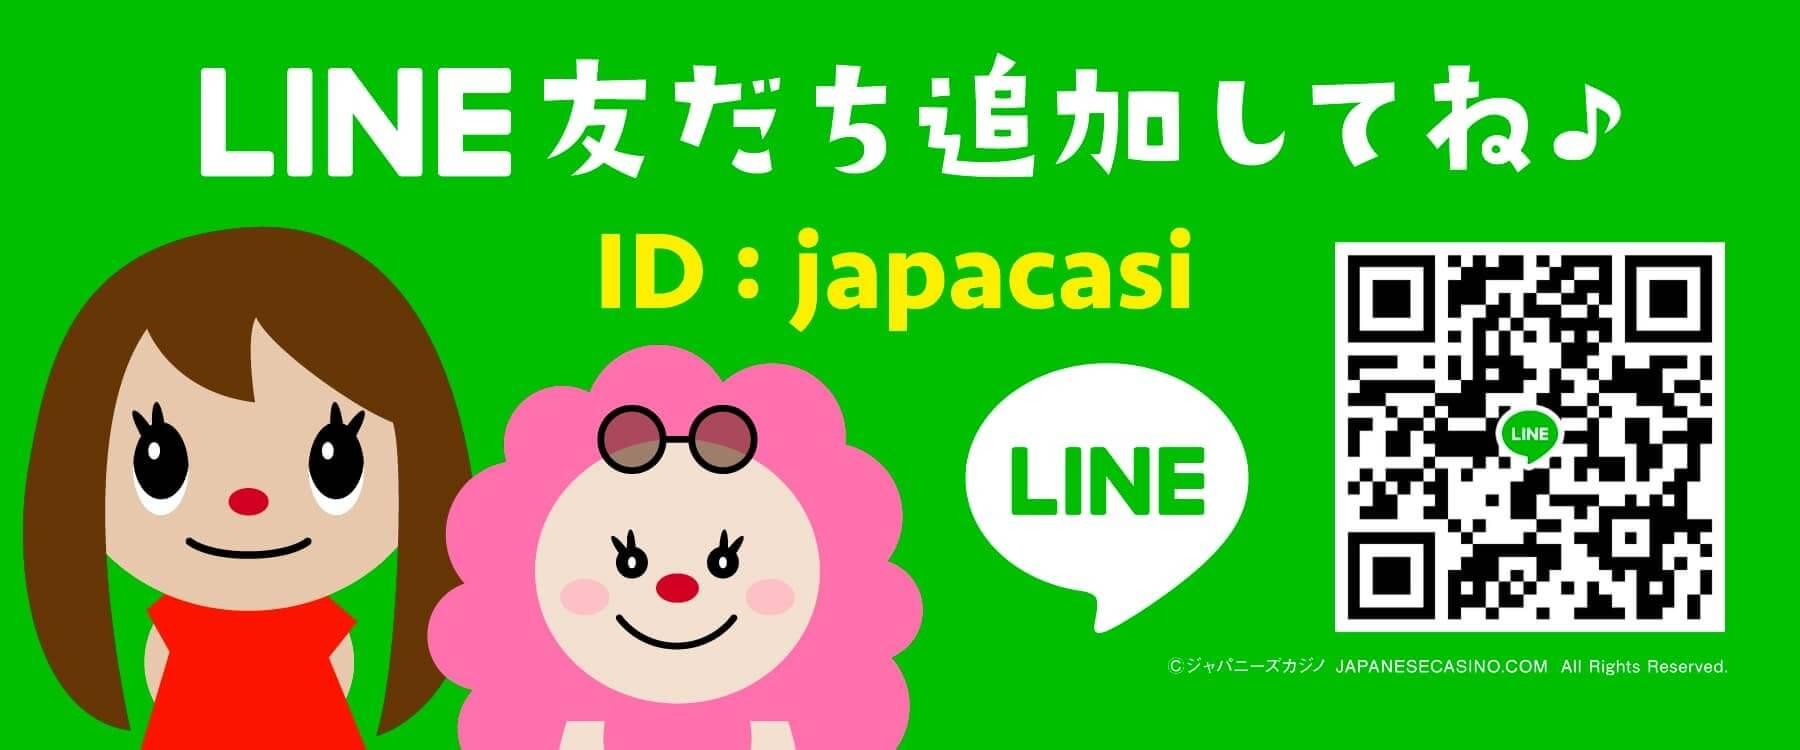 japacasi-line